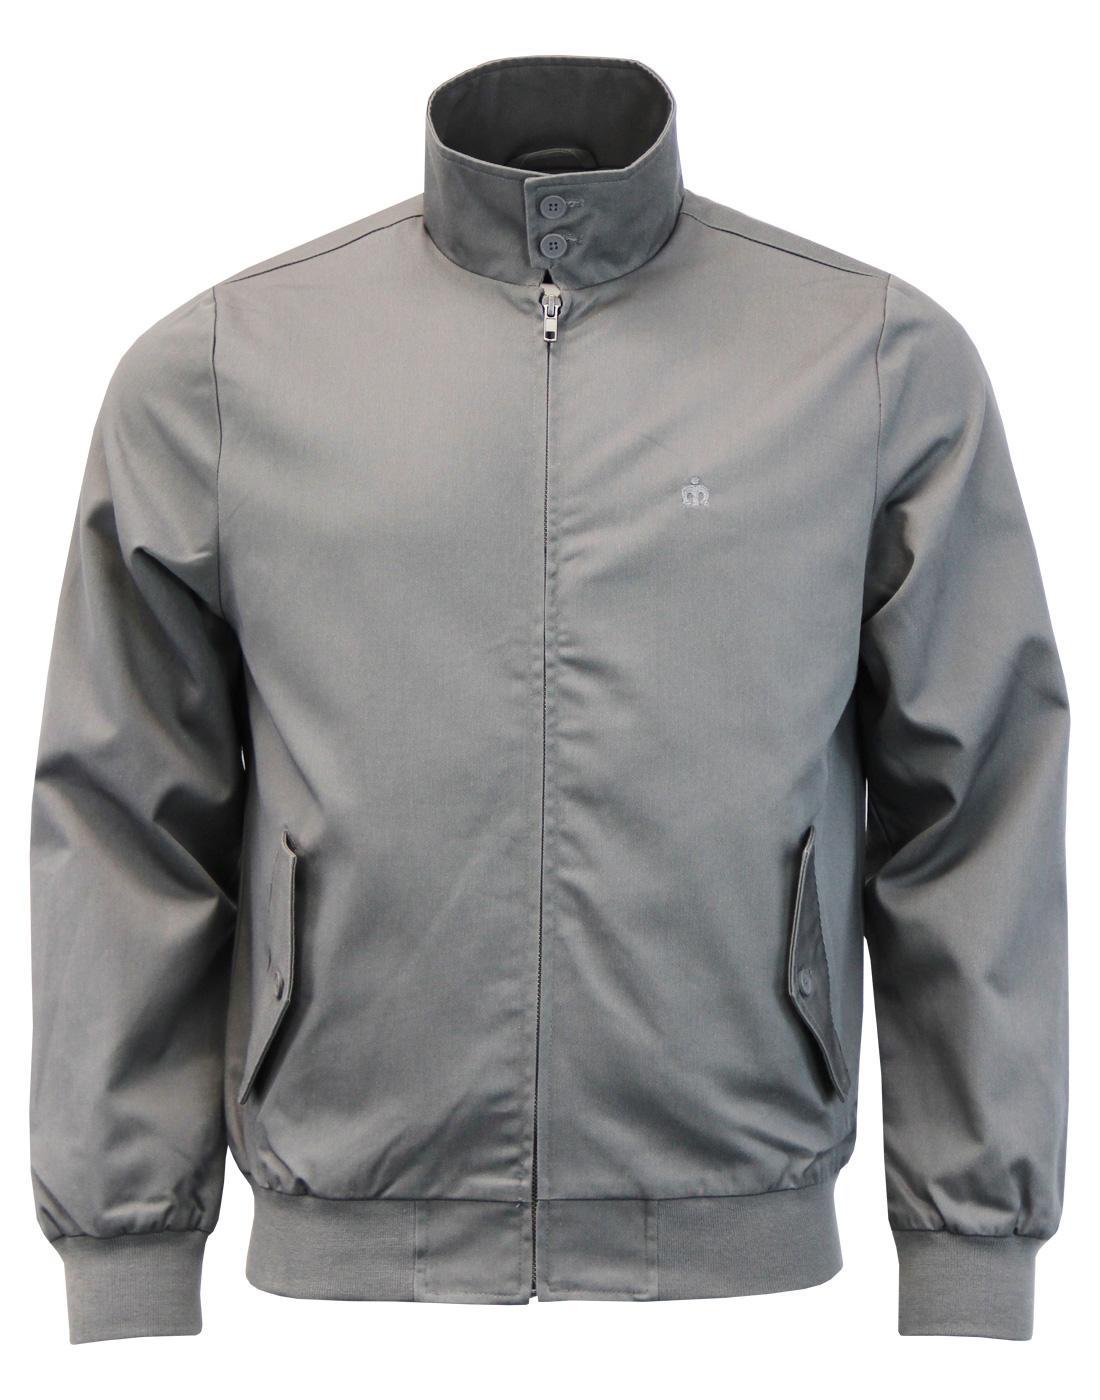 MERC Retro Mod Tartan Lined Harrington Jacket (DG)